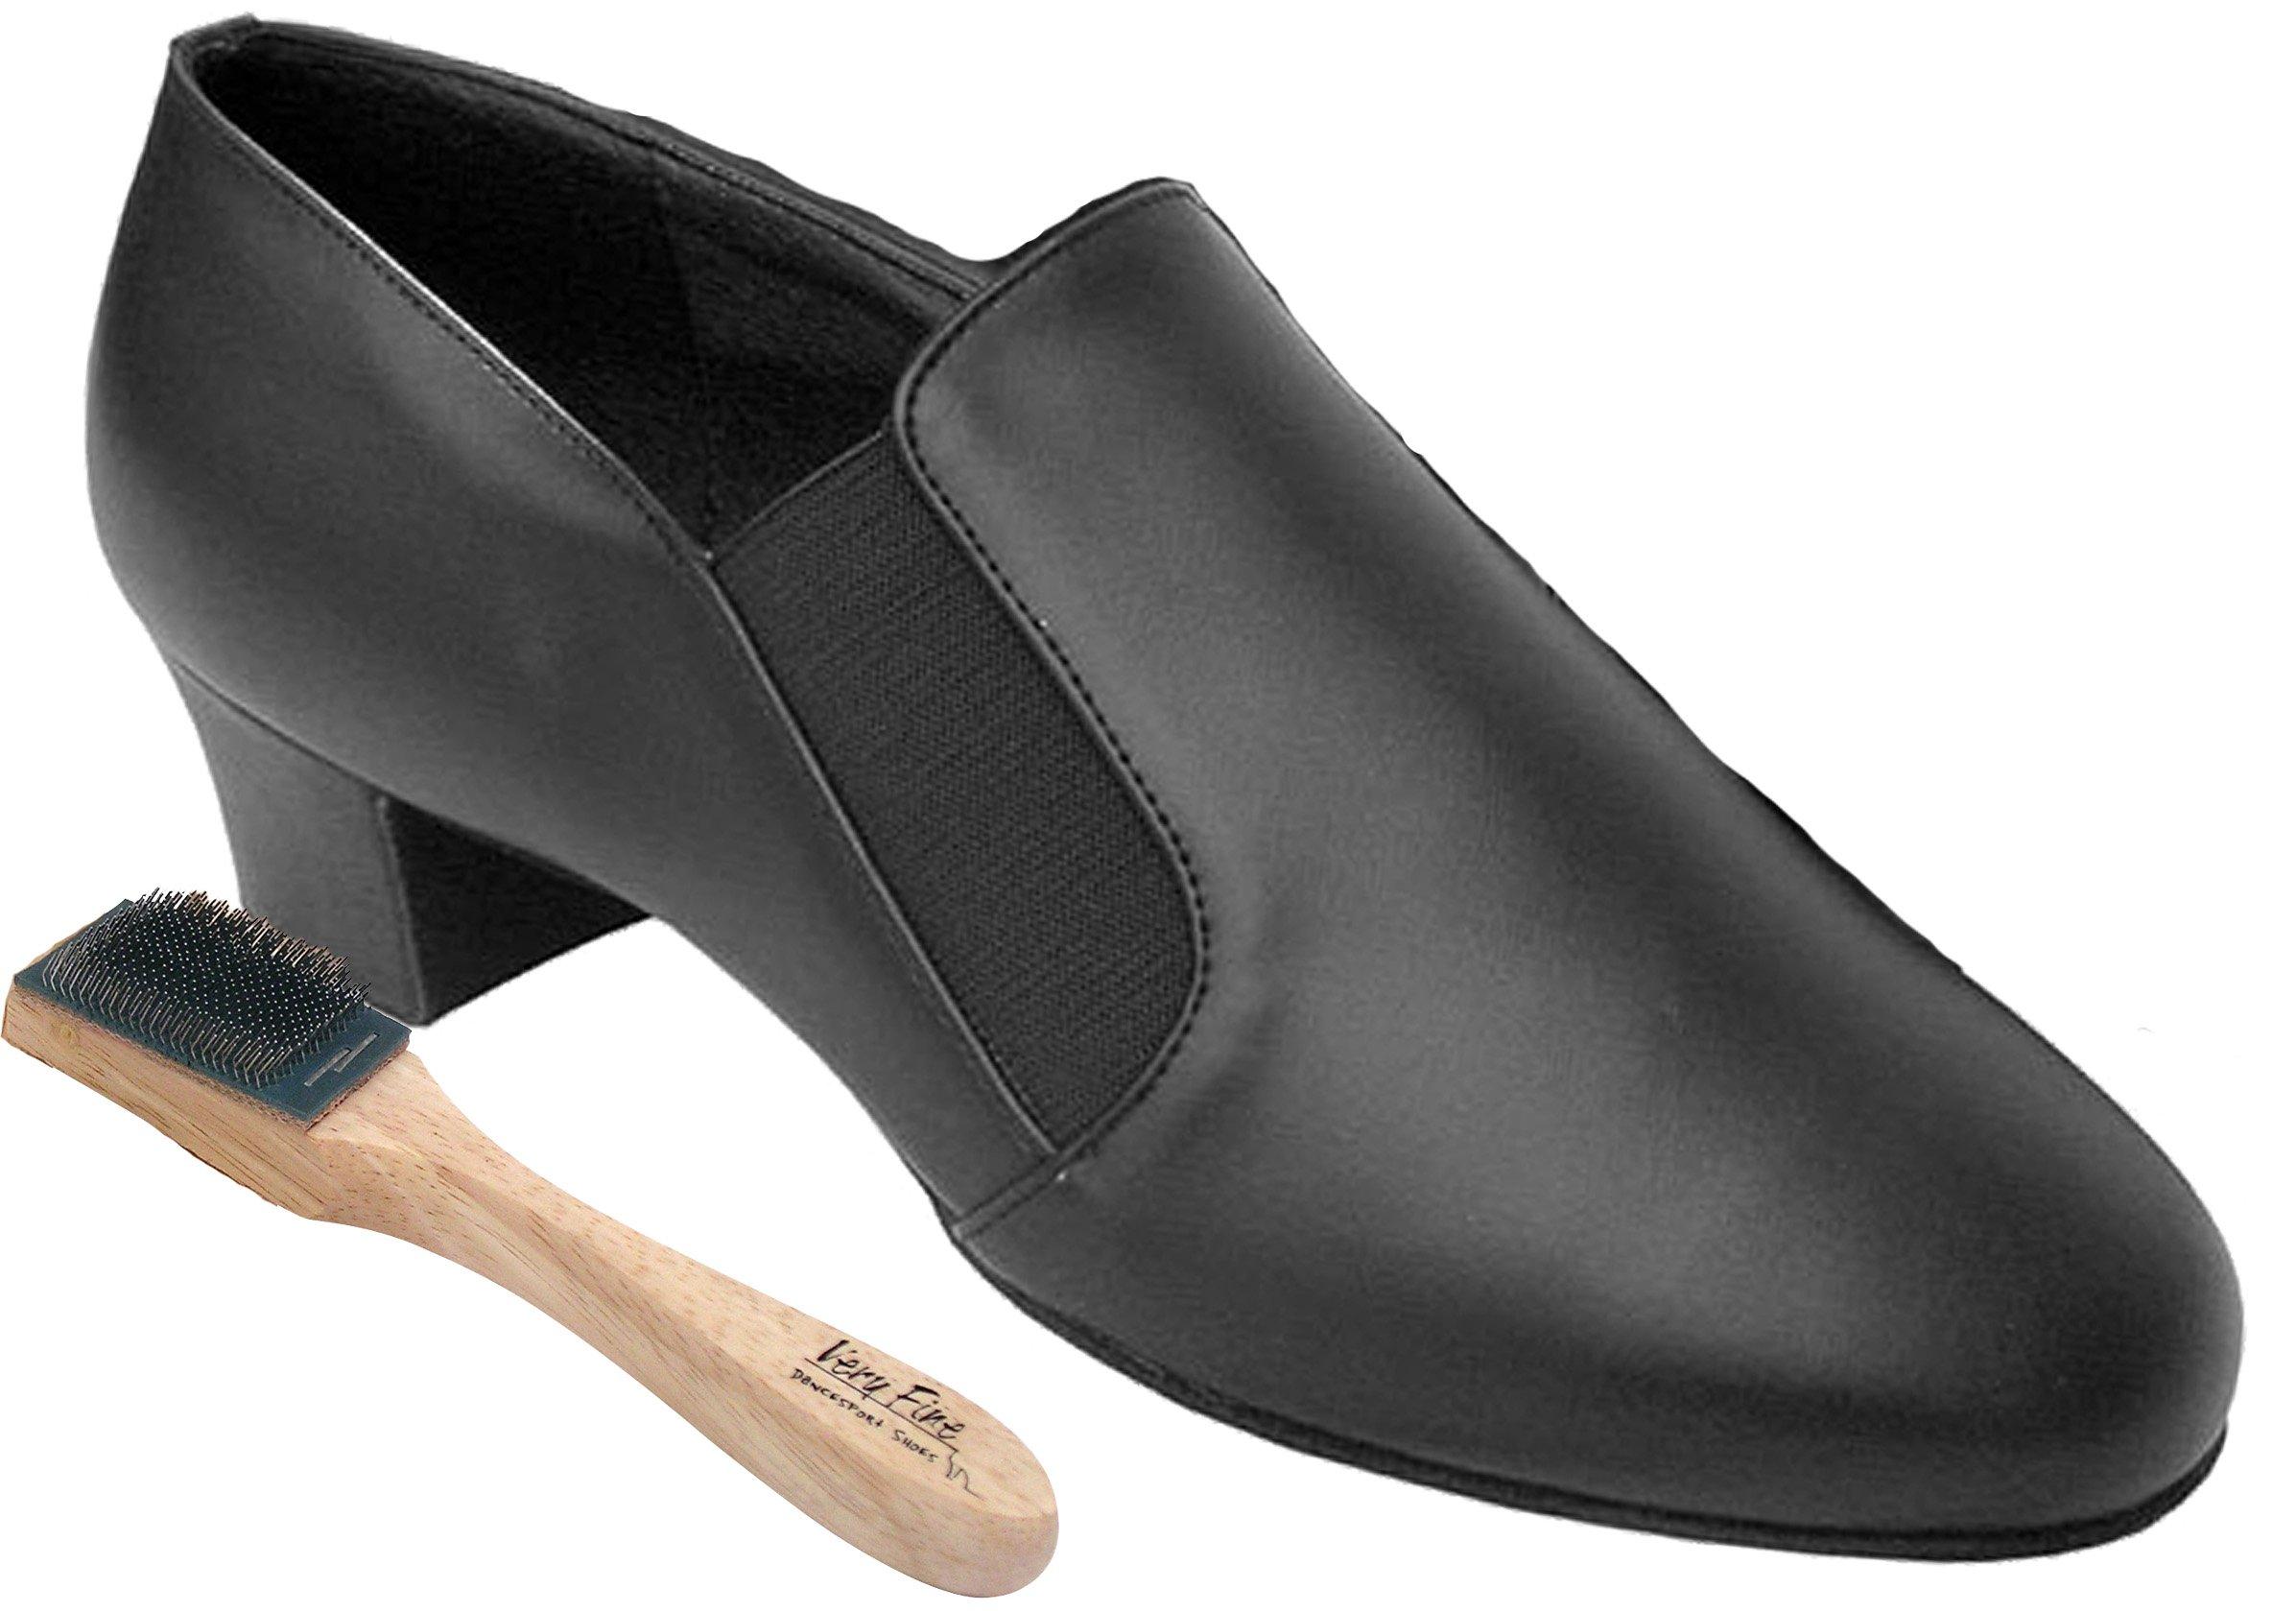 Very Fine Men's Salsa Ballroom Tango Latin Dance Shoes Style S805 Bundle with Dance Shoe Wire Brush, Black Leather 8.5 M US Heel 1.5 Inch